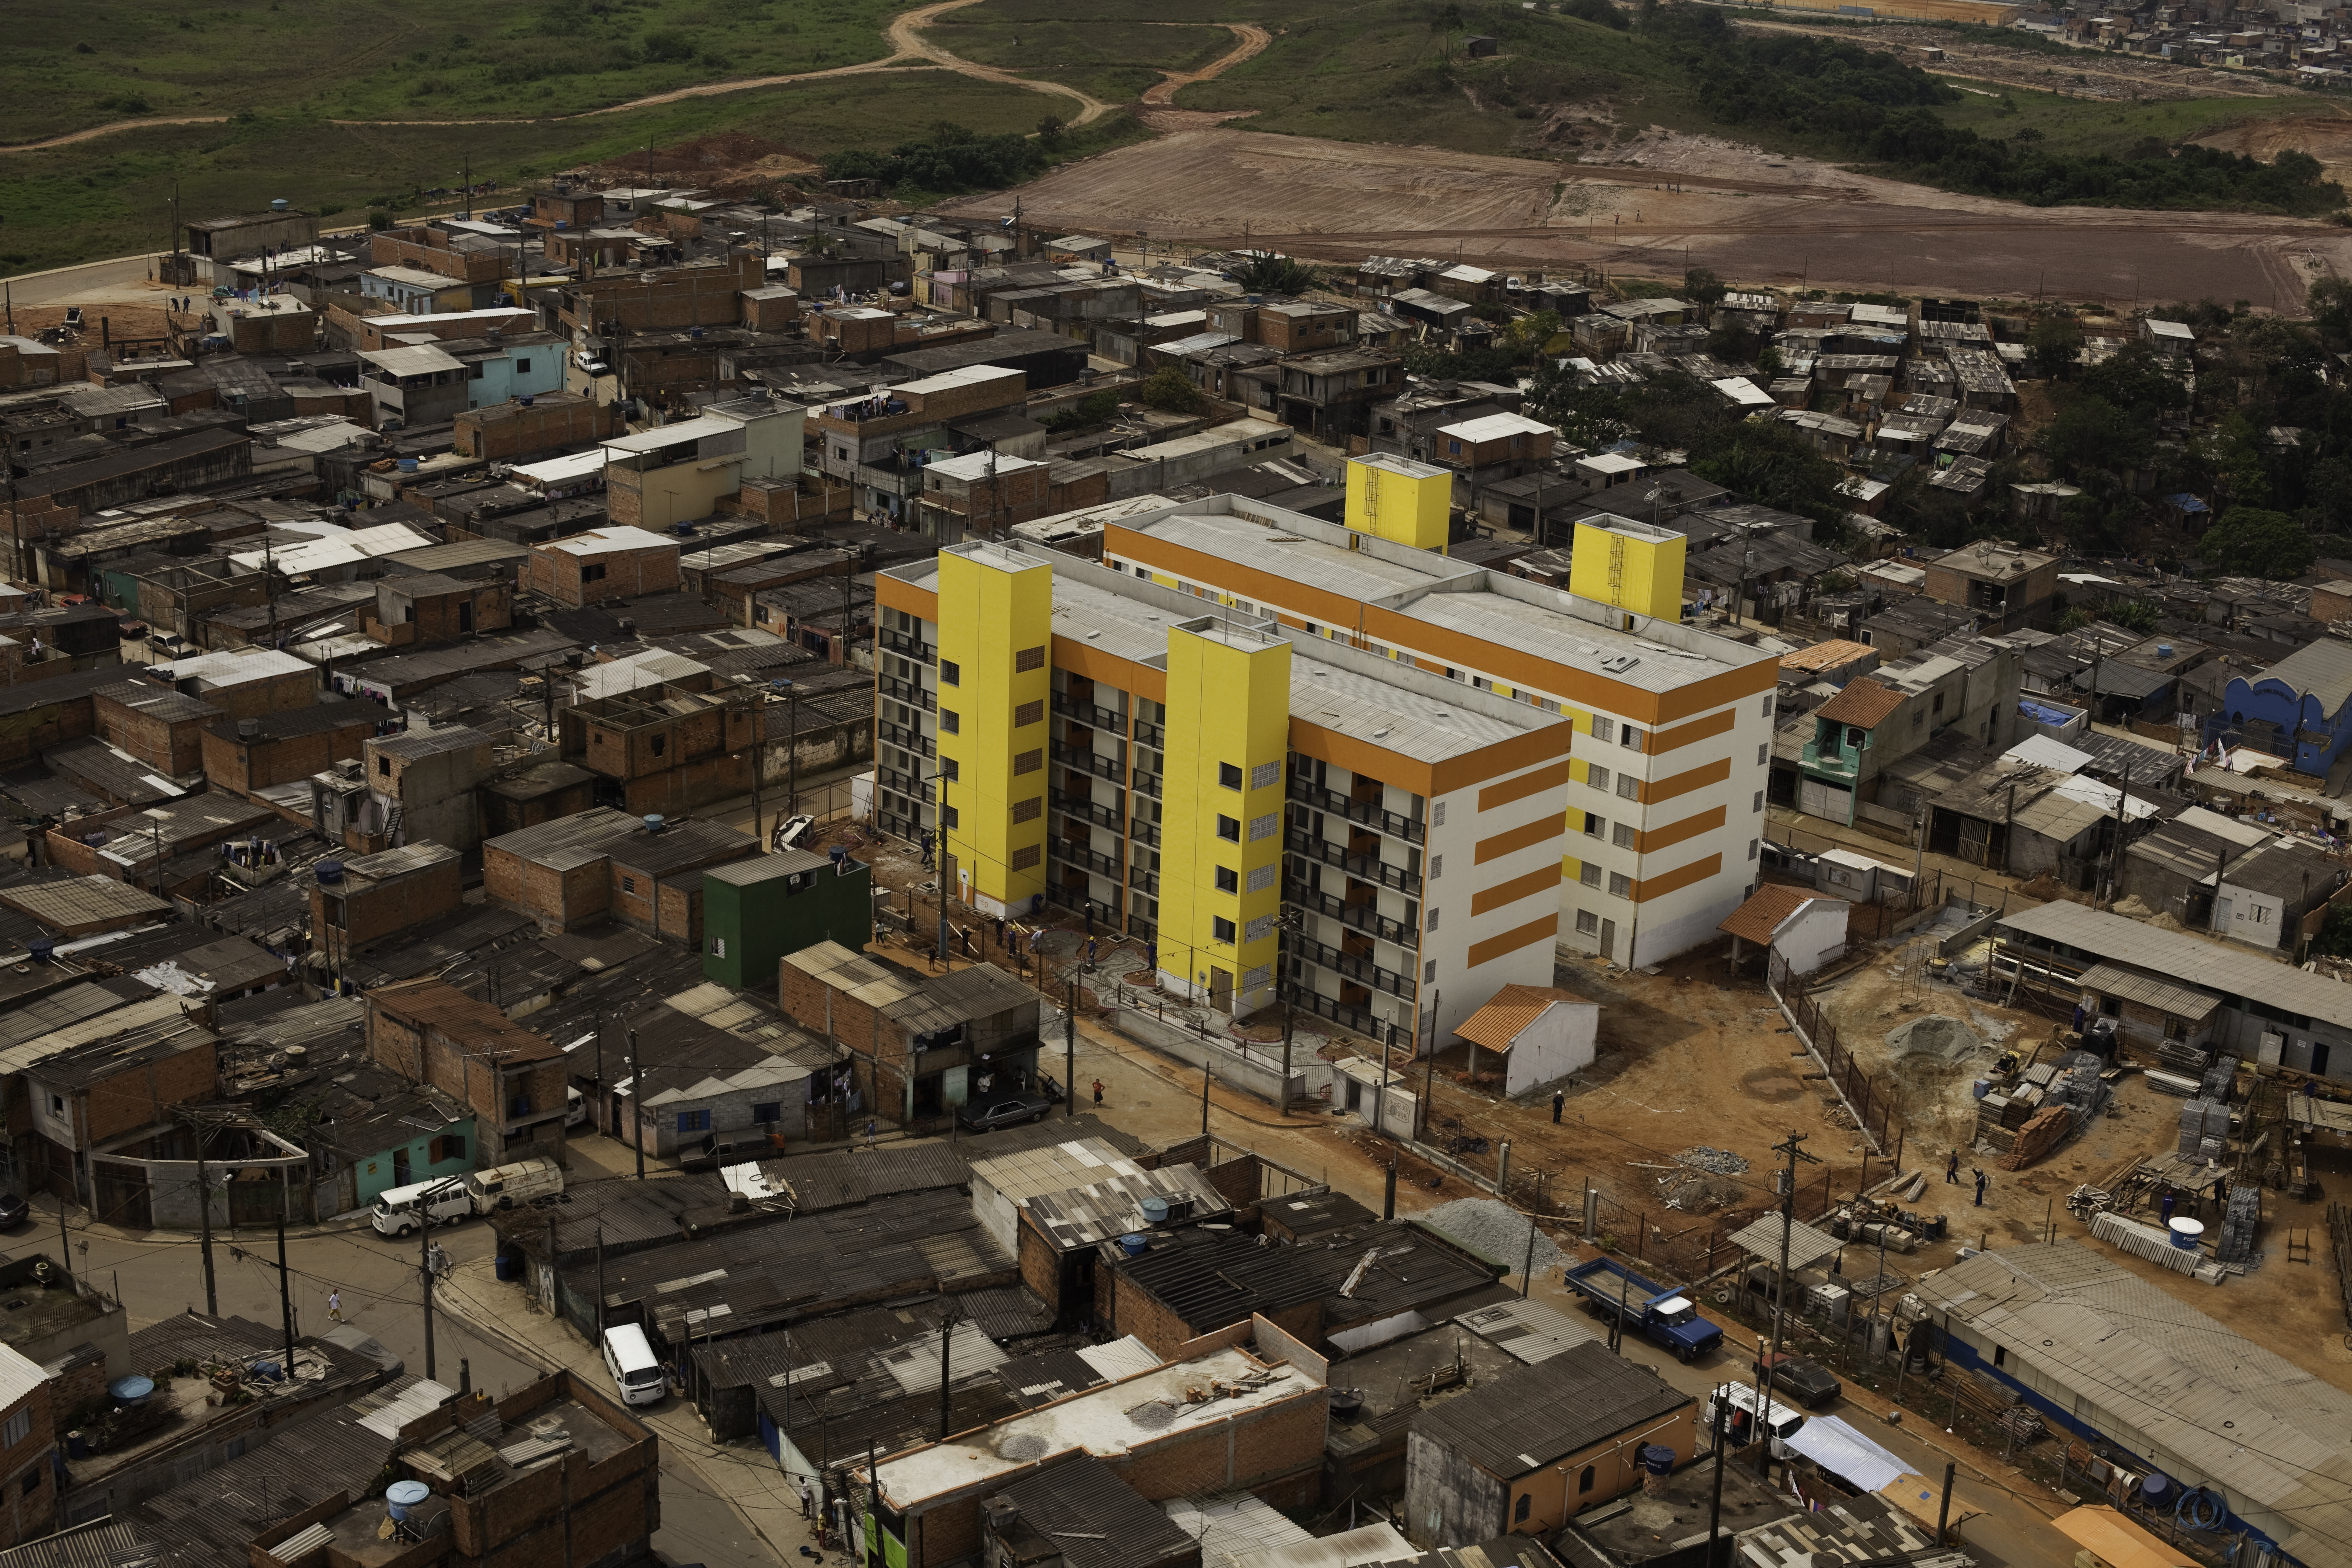 Social Housing - Aerial View 02